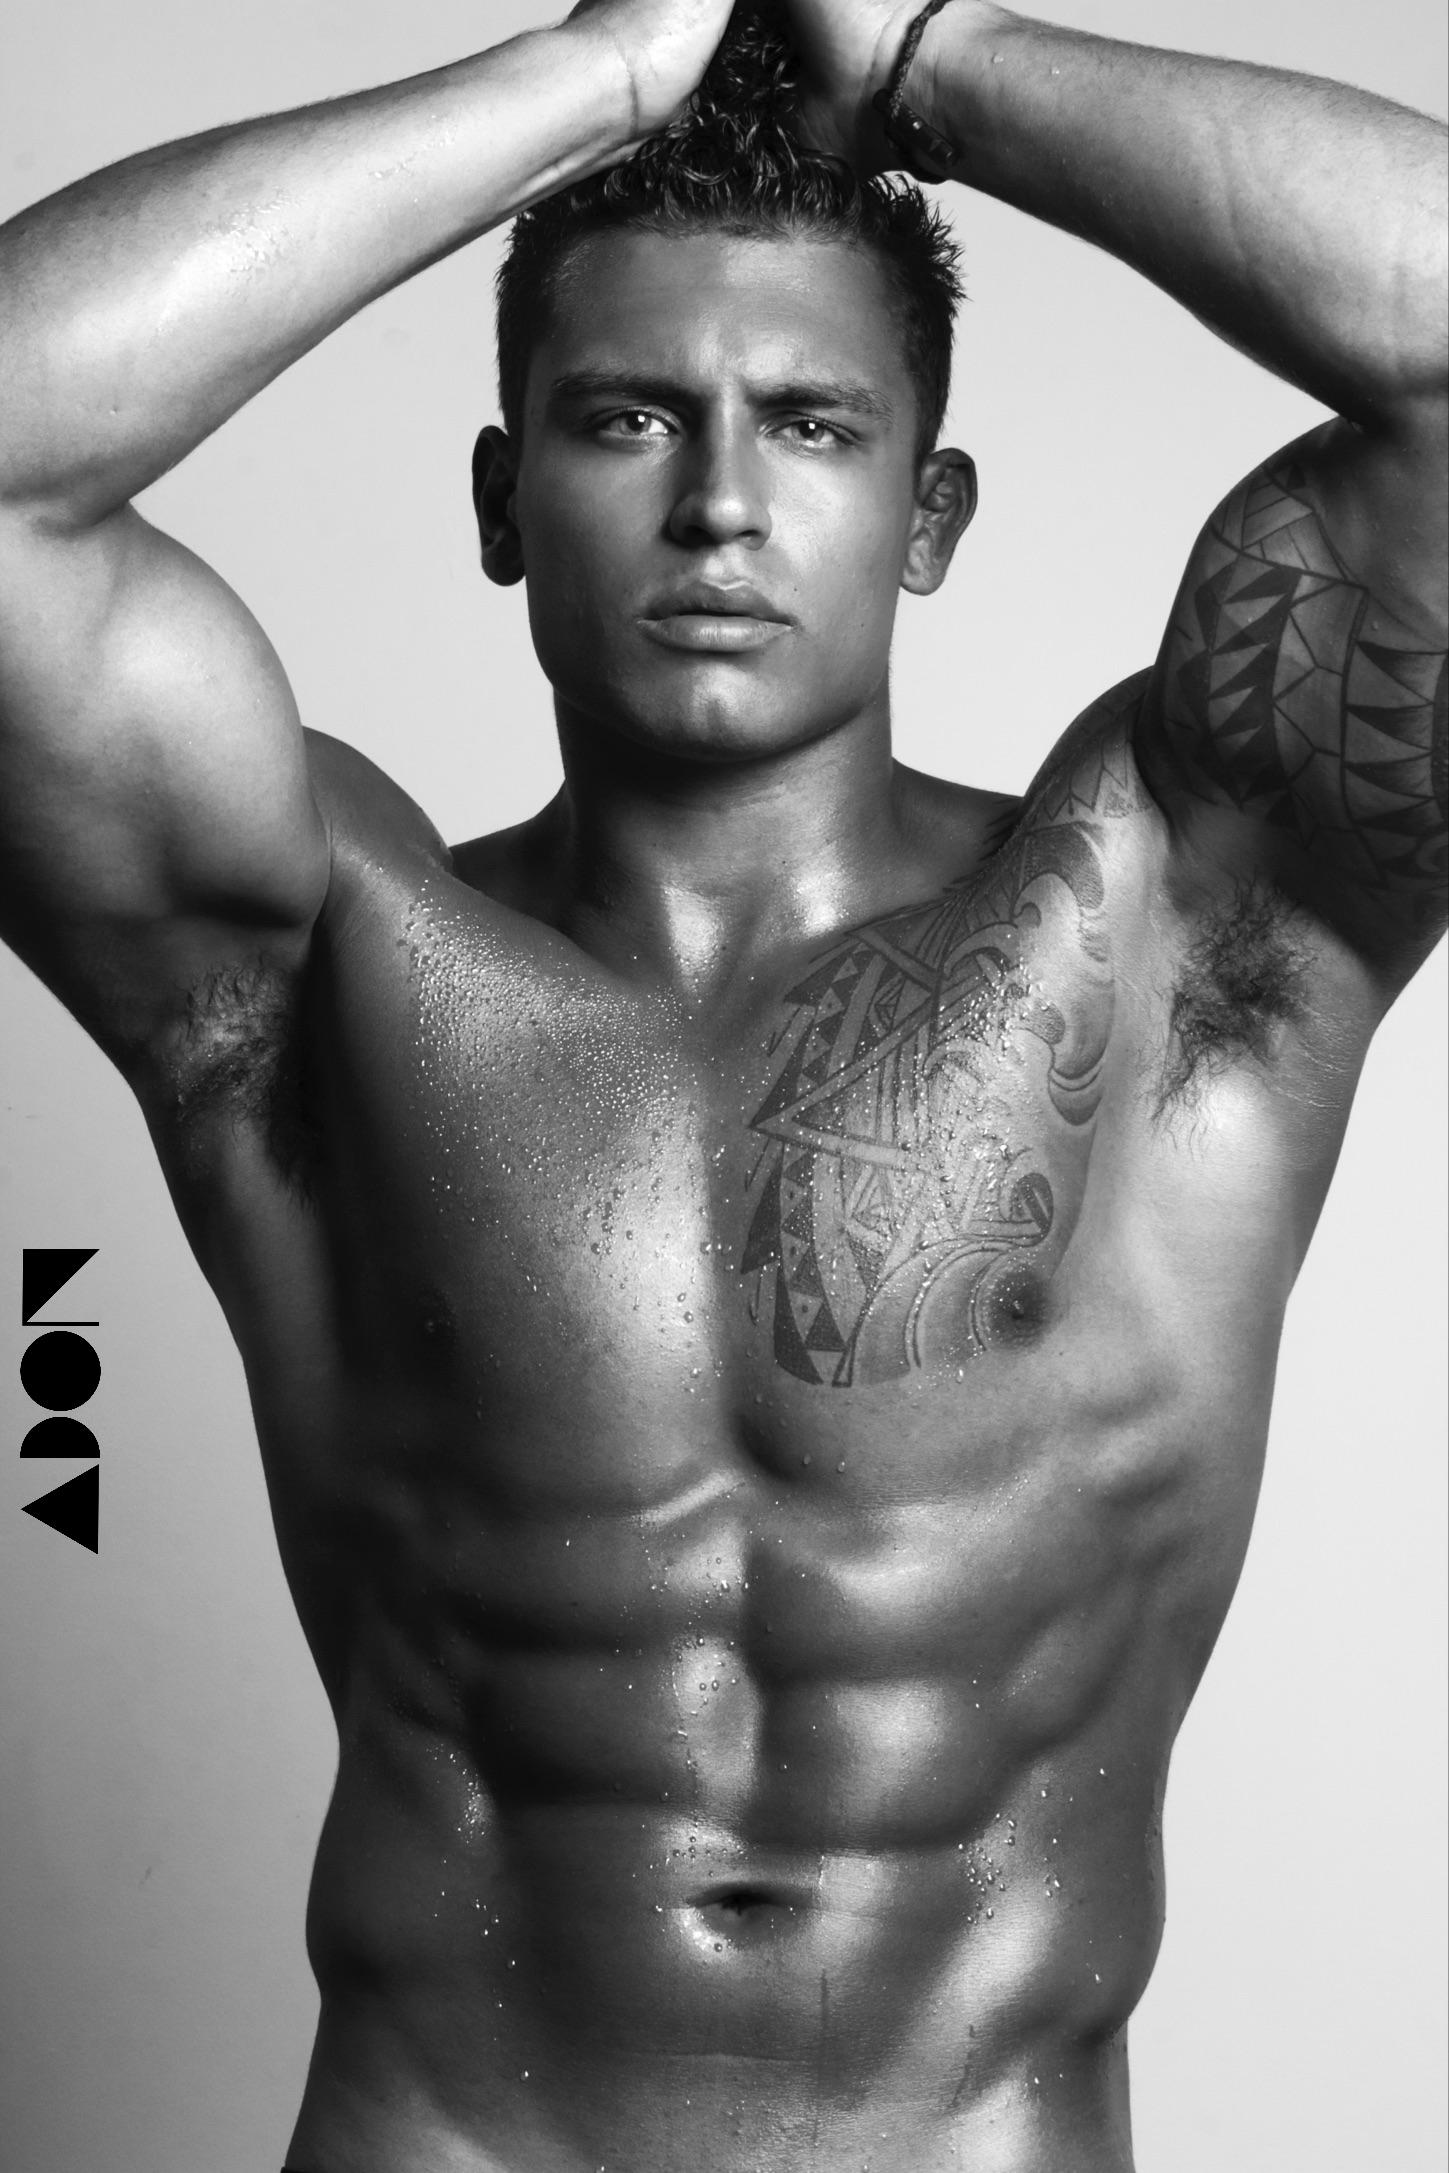 Adon Exclusive: Model Nick Rodriguez By Balthier Corfi